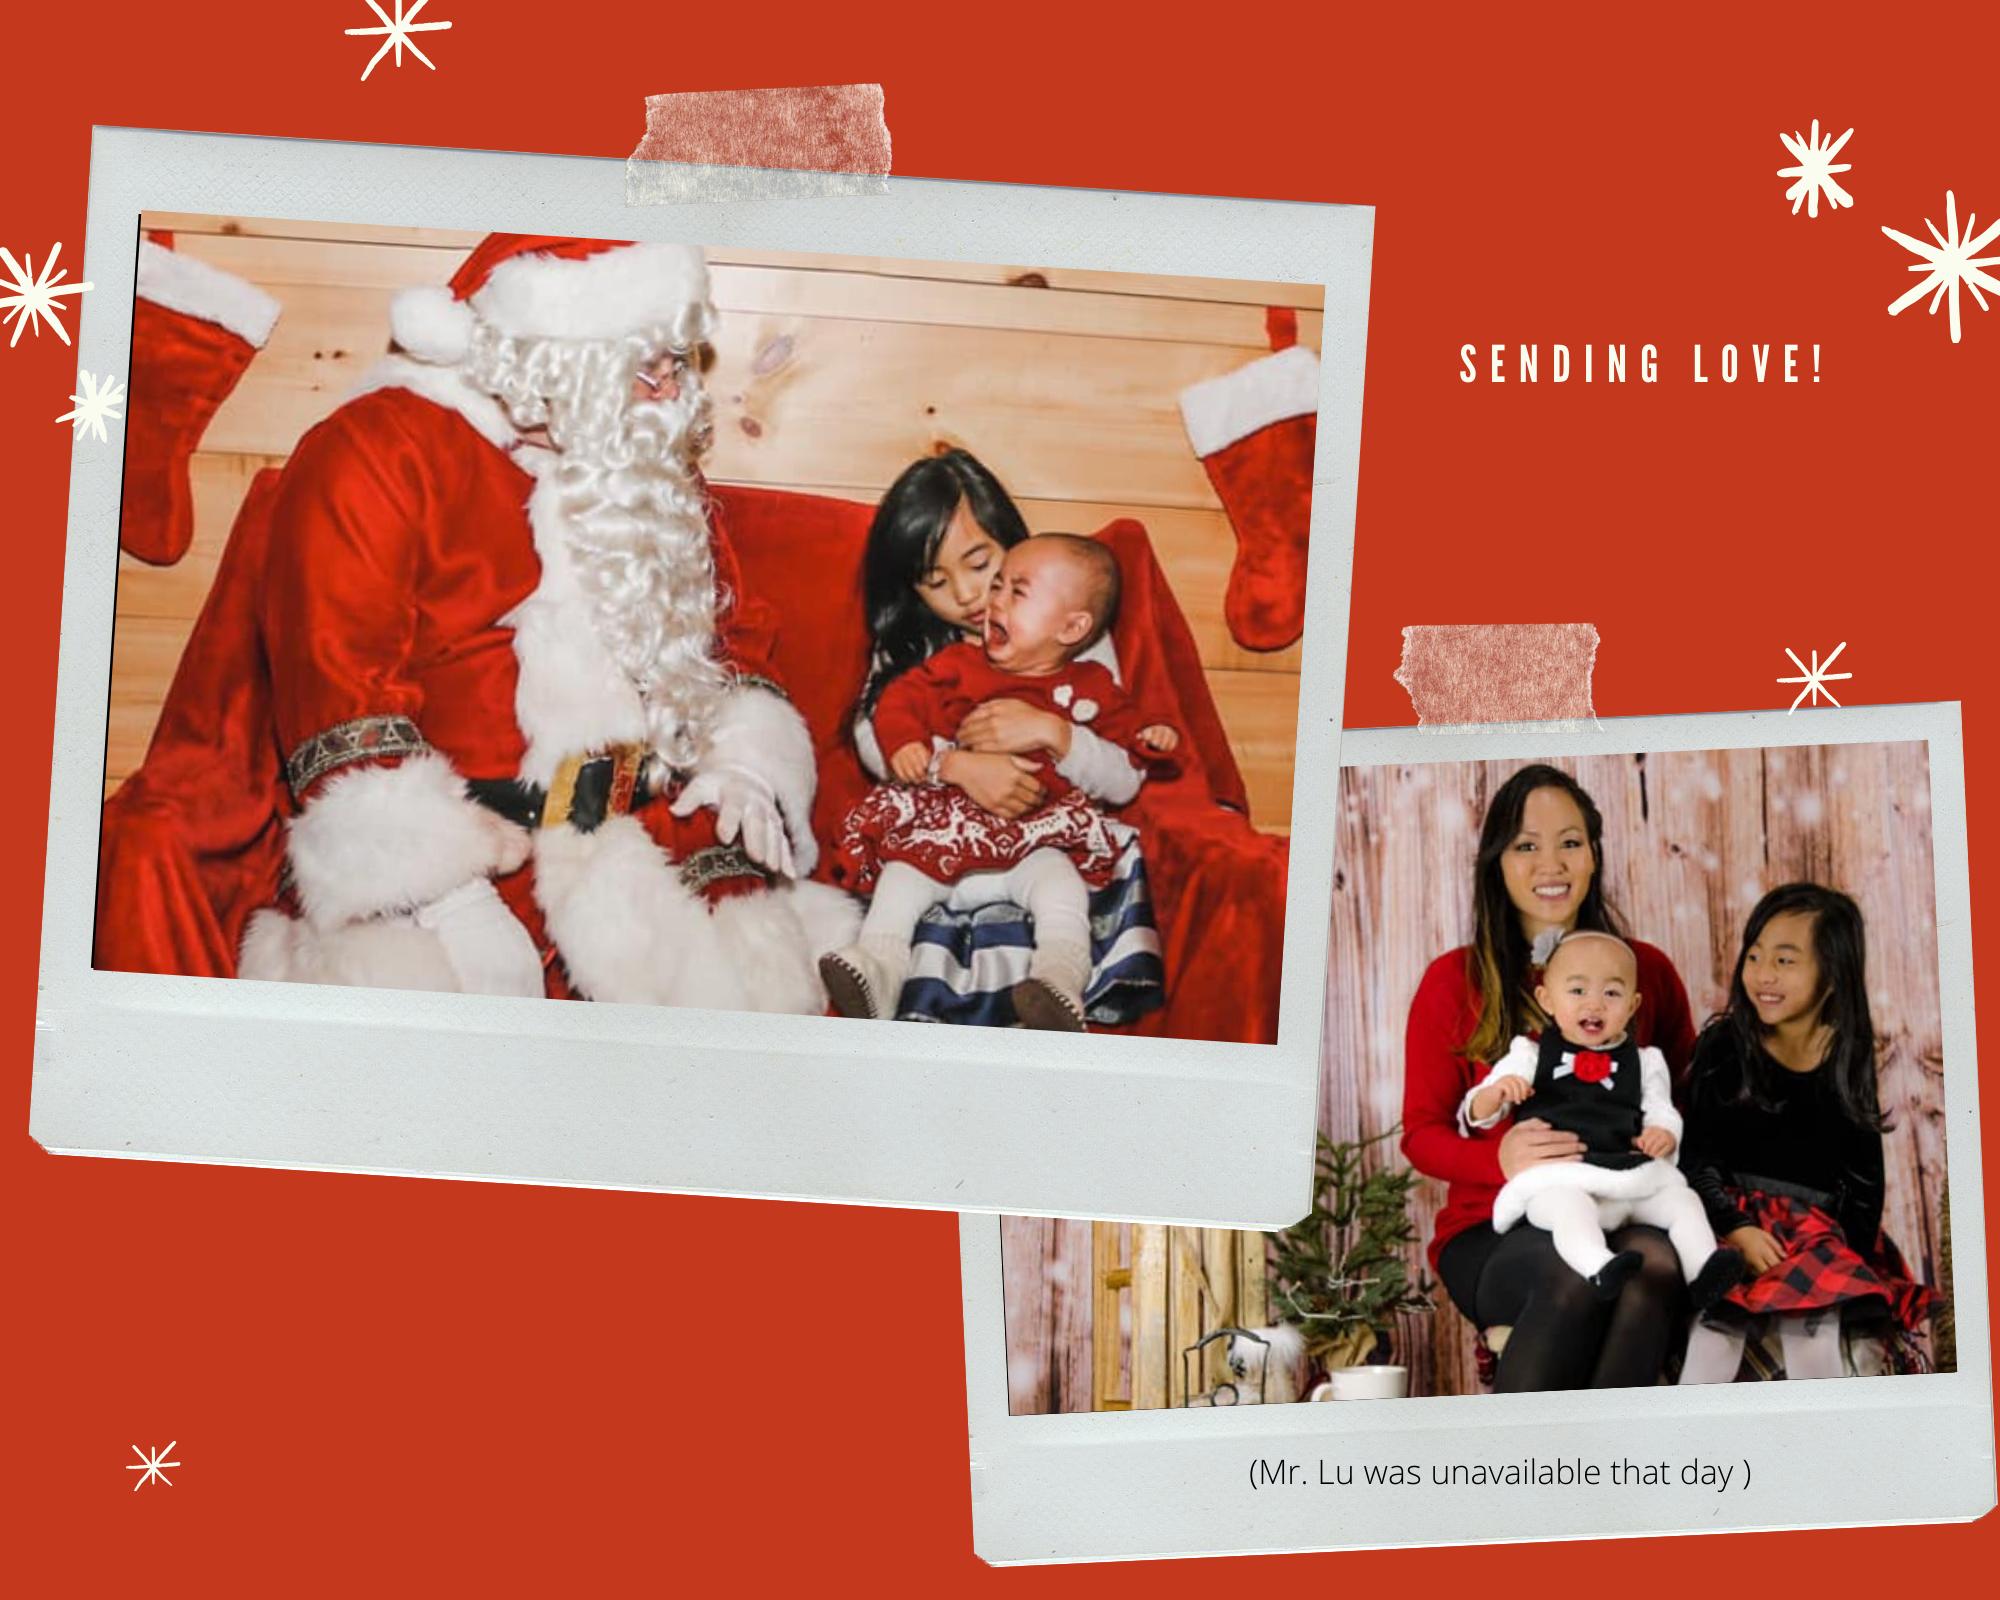 Santa photo with crying baby. Year 2020.